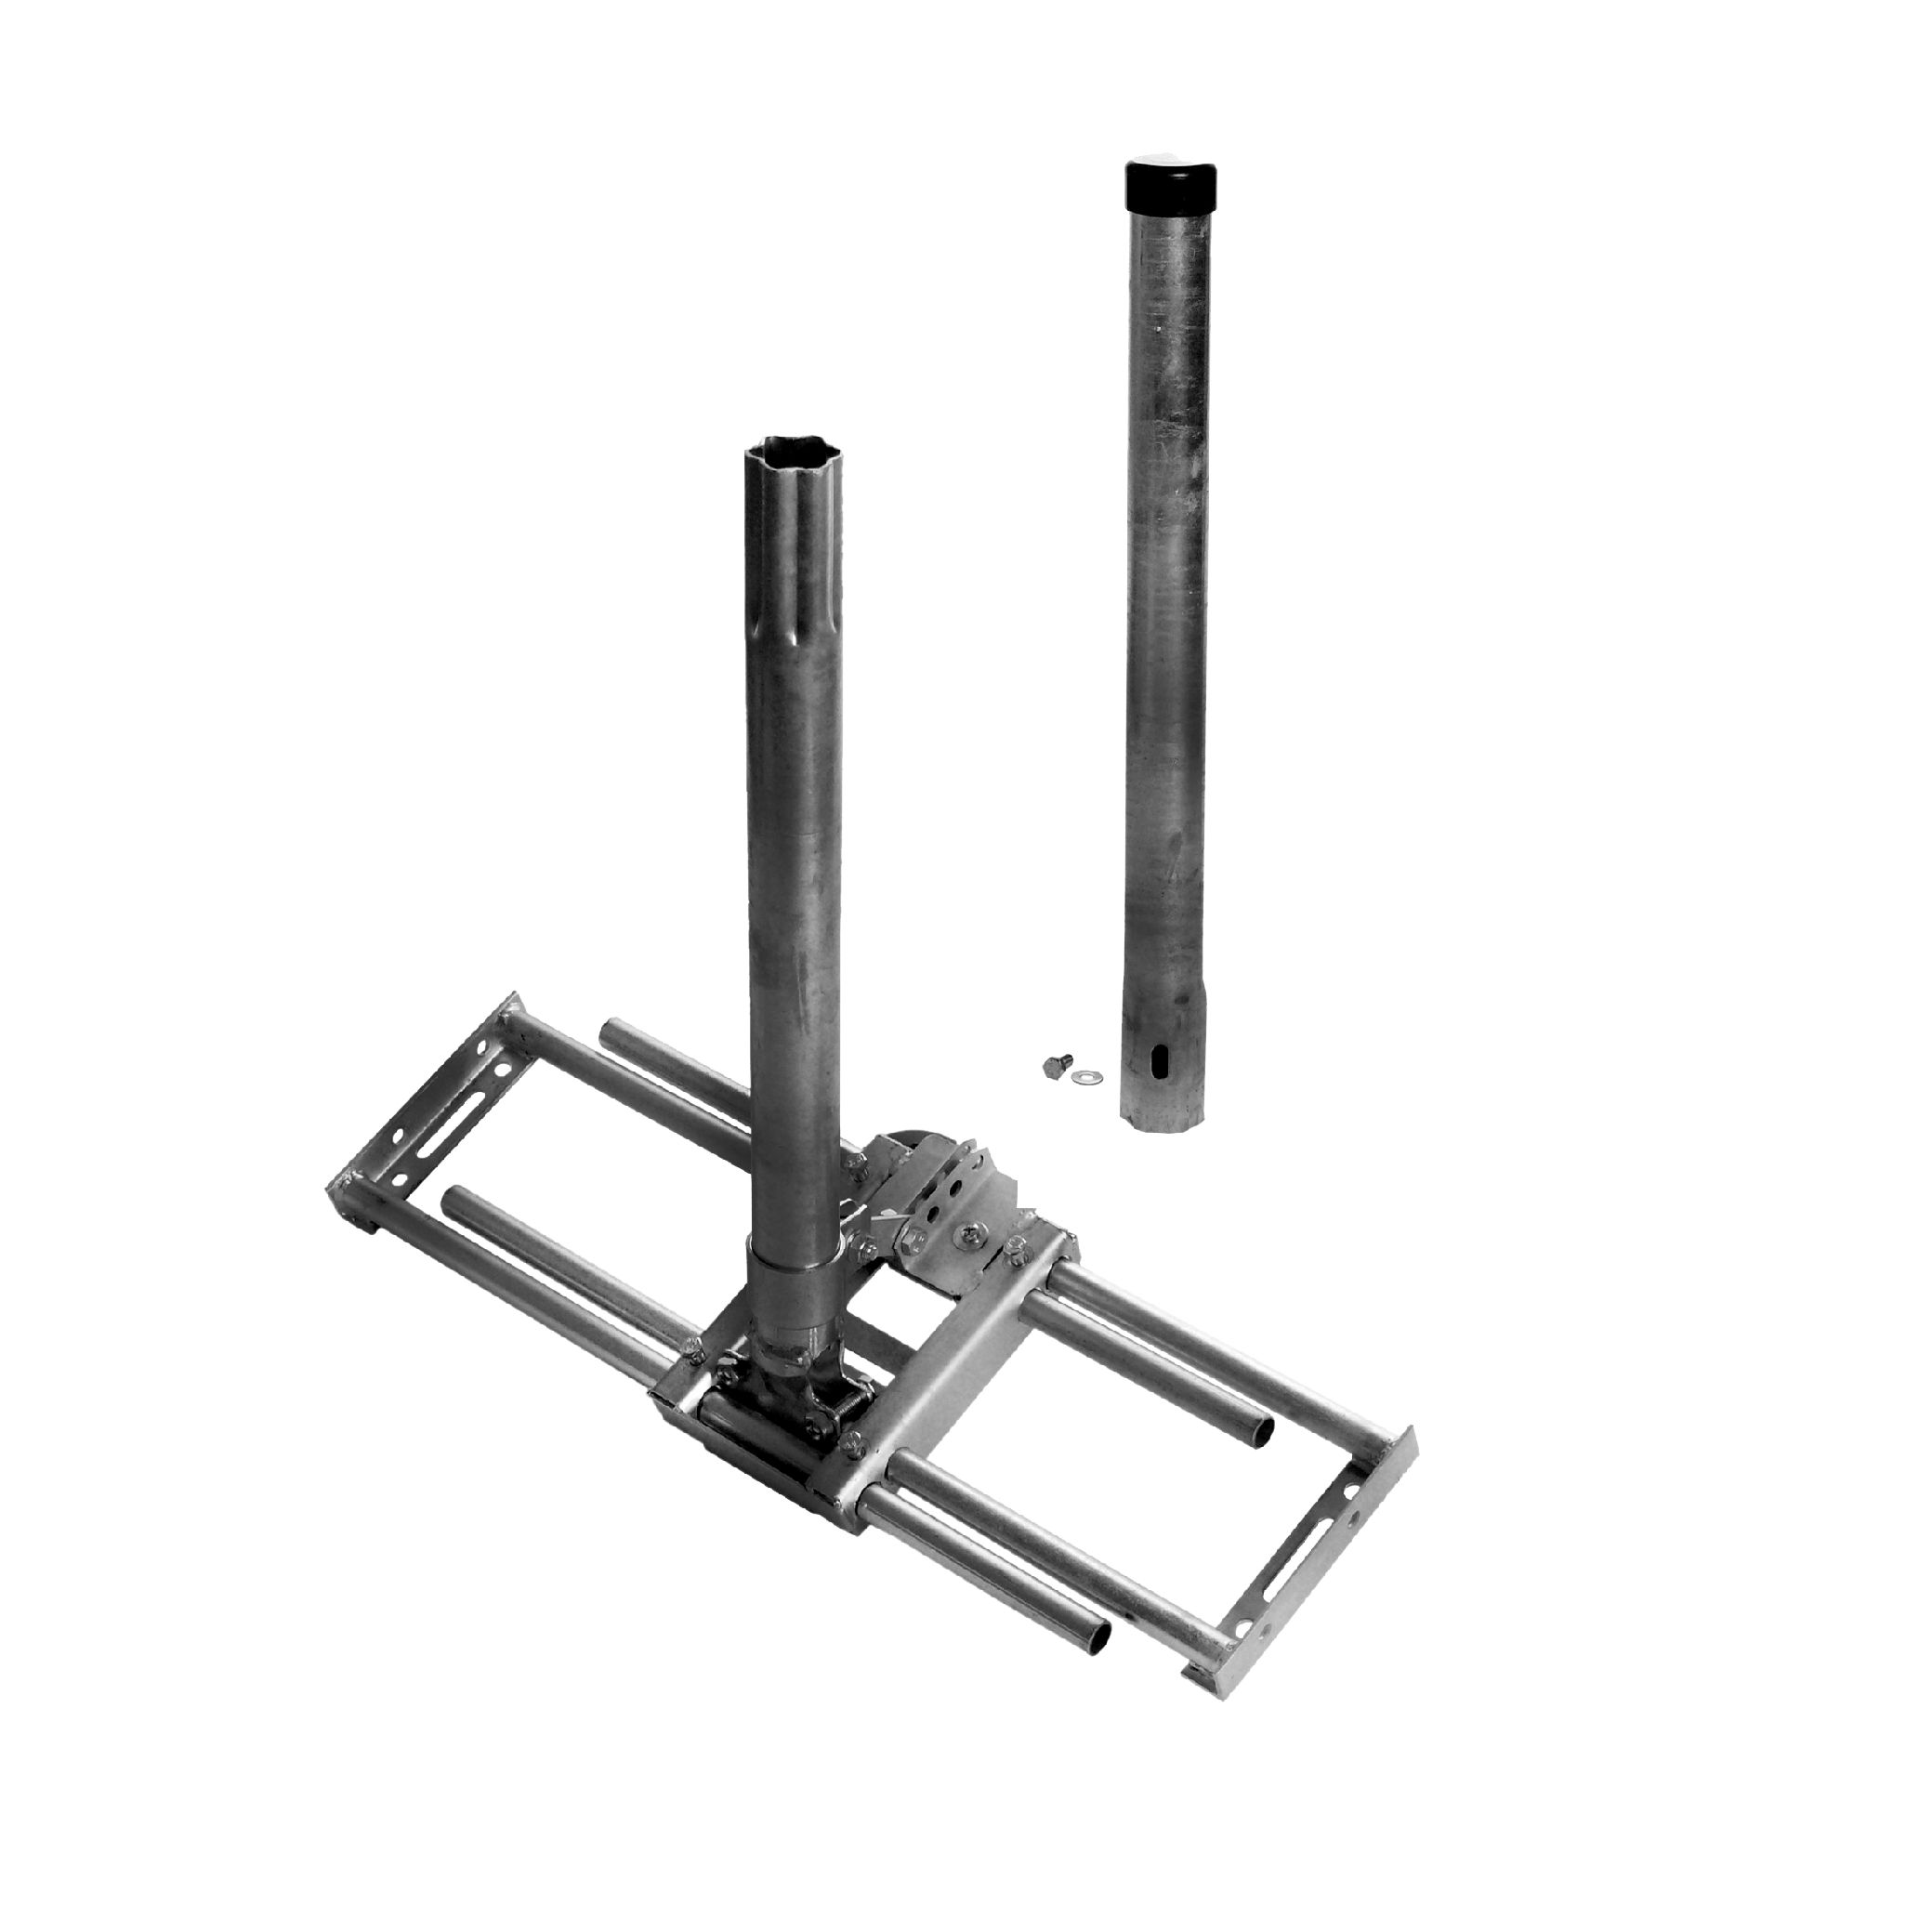 1 Stk SAT Dachsparrenhalter Universal,inkl.Mast 1.100,Horiz.,Stahl HSATMS02S-